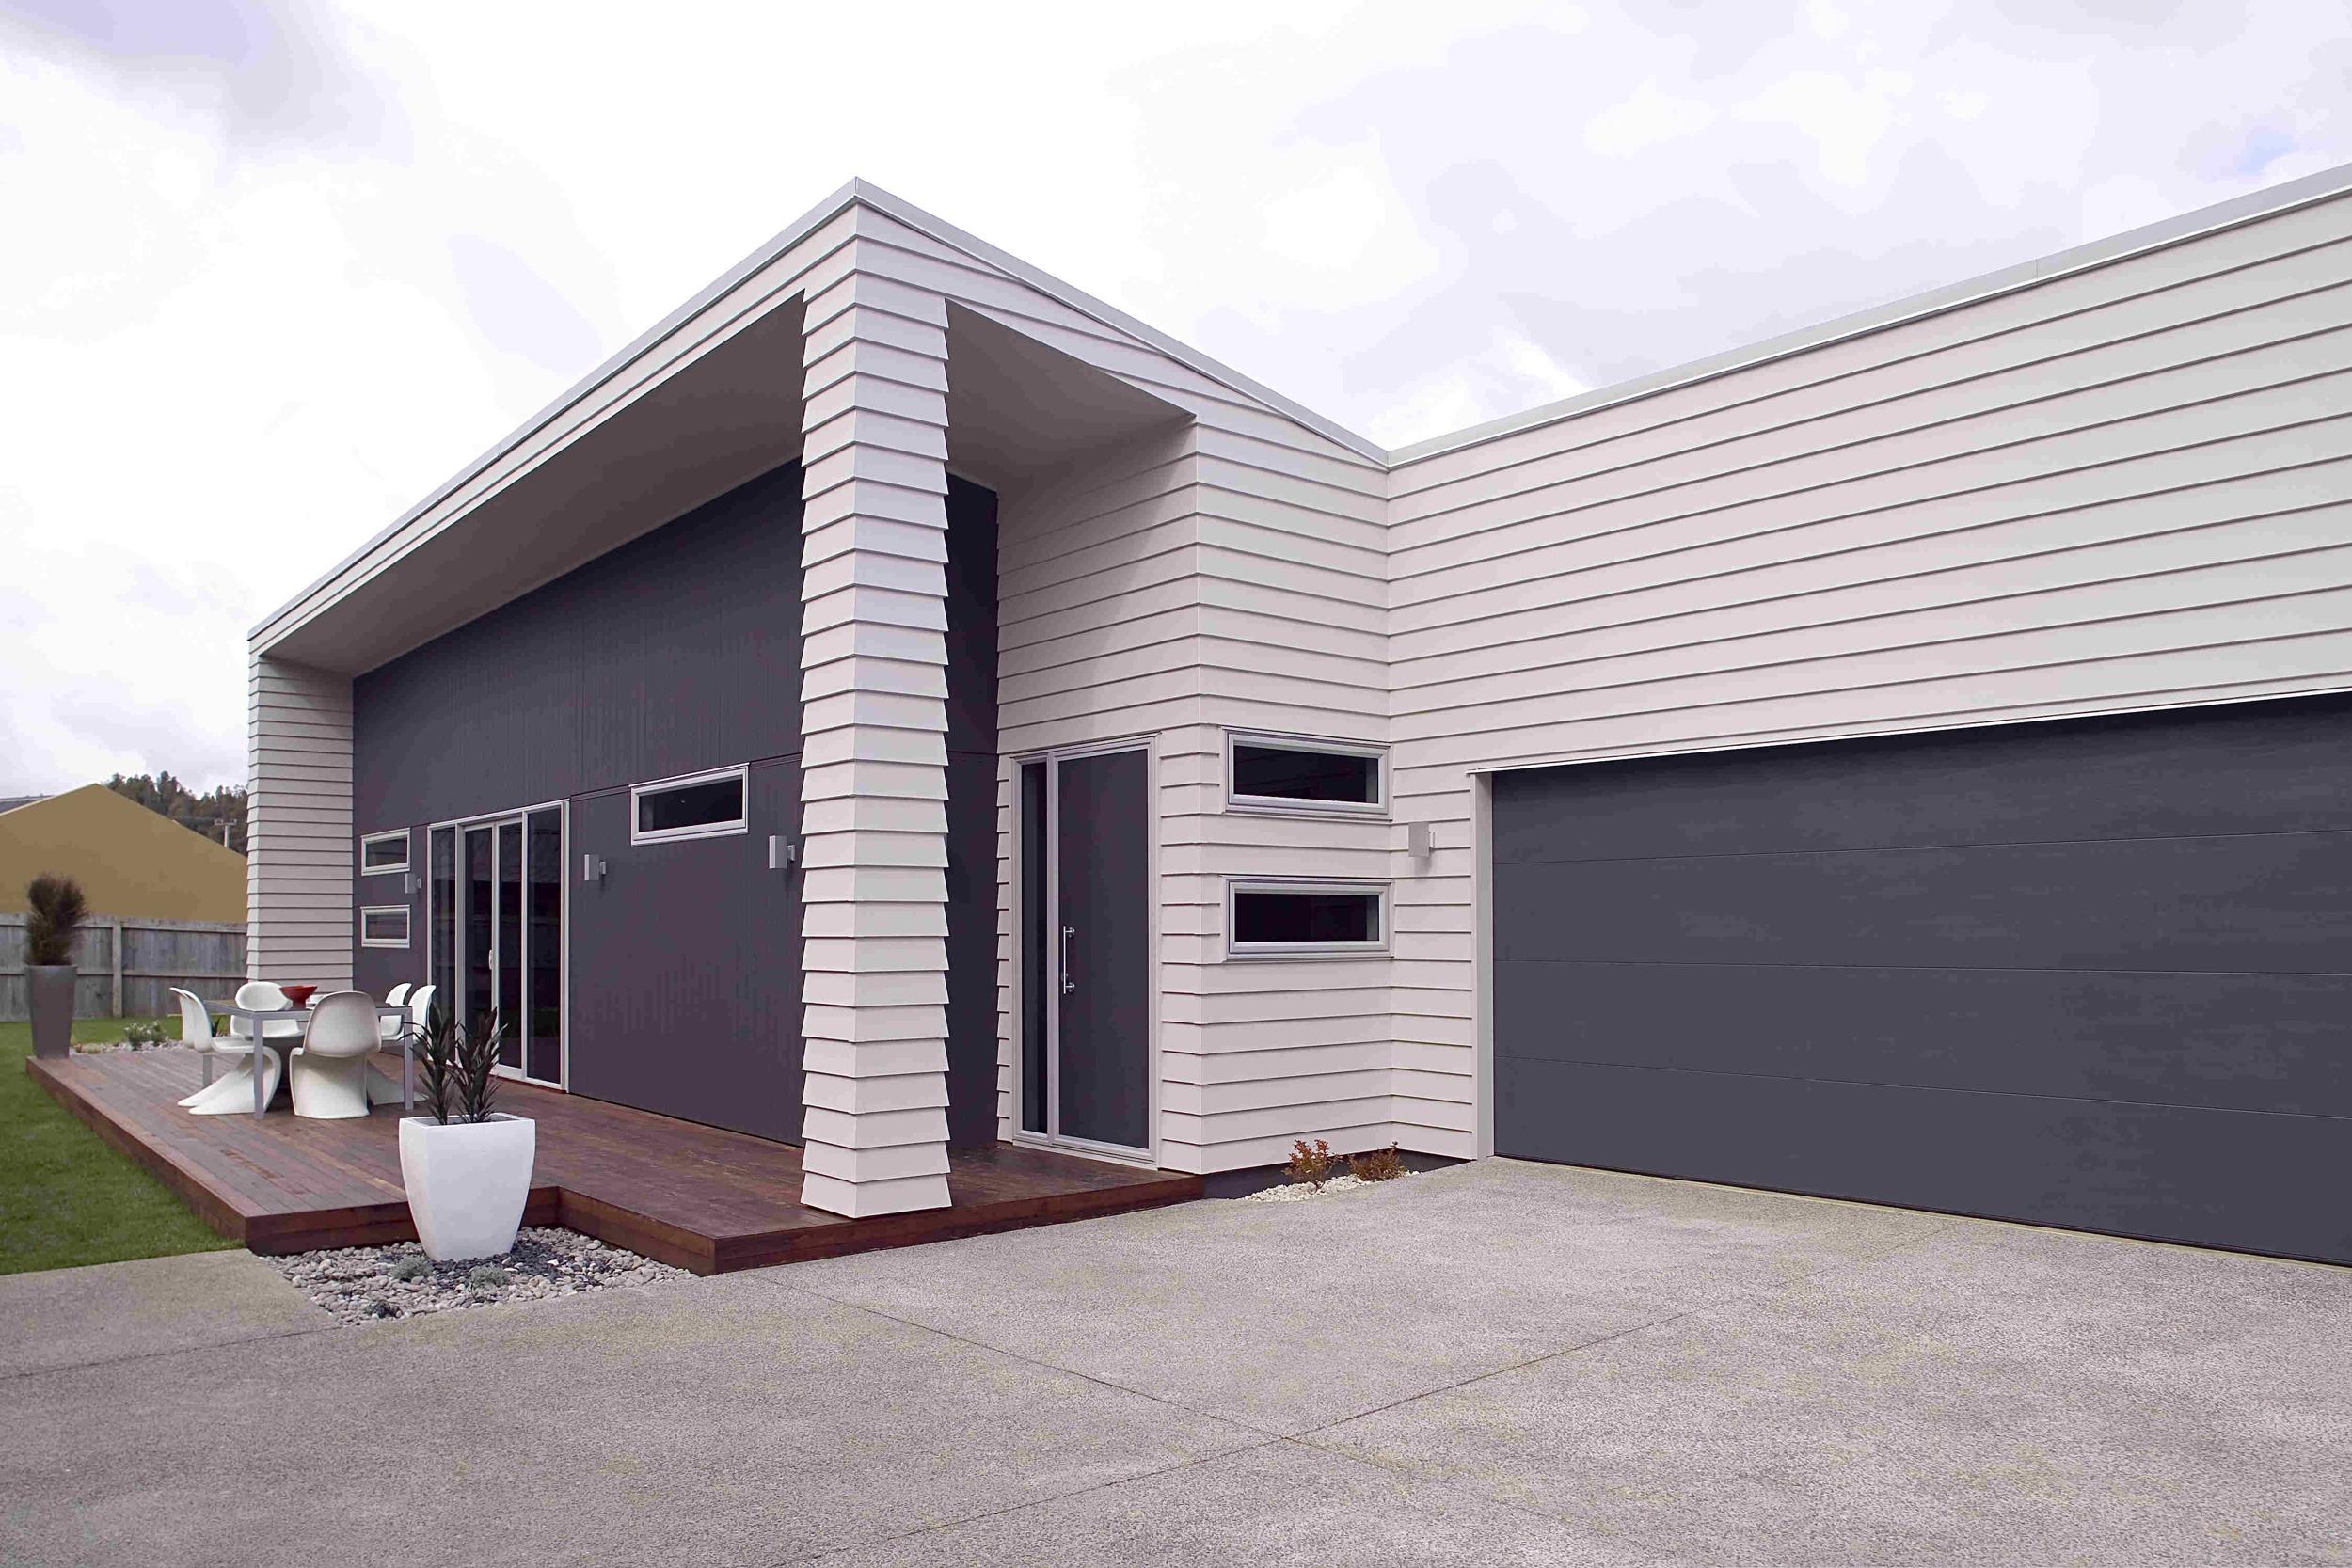 haven-builder-residential-les-fisher-6.jpg